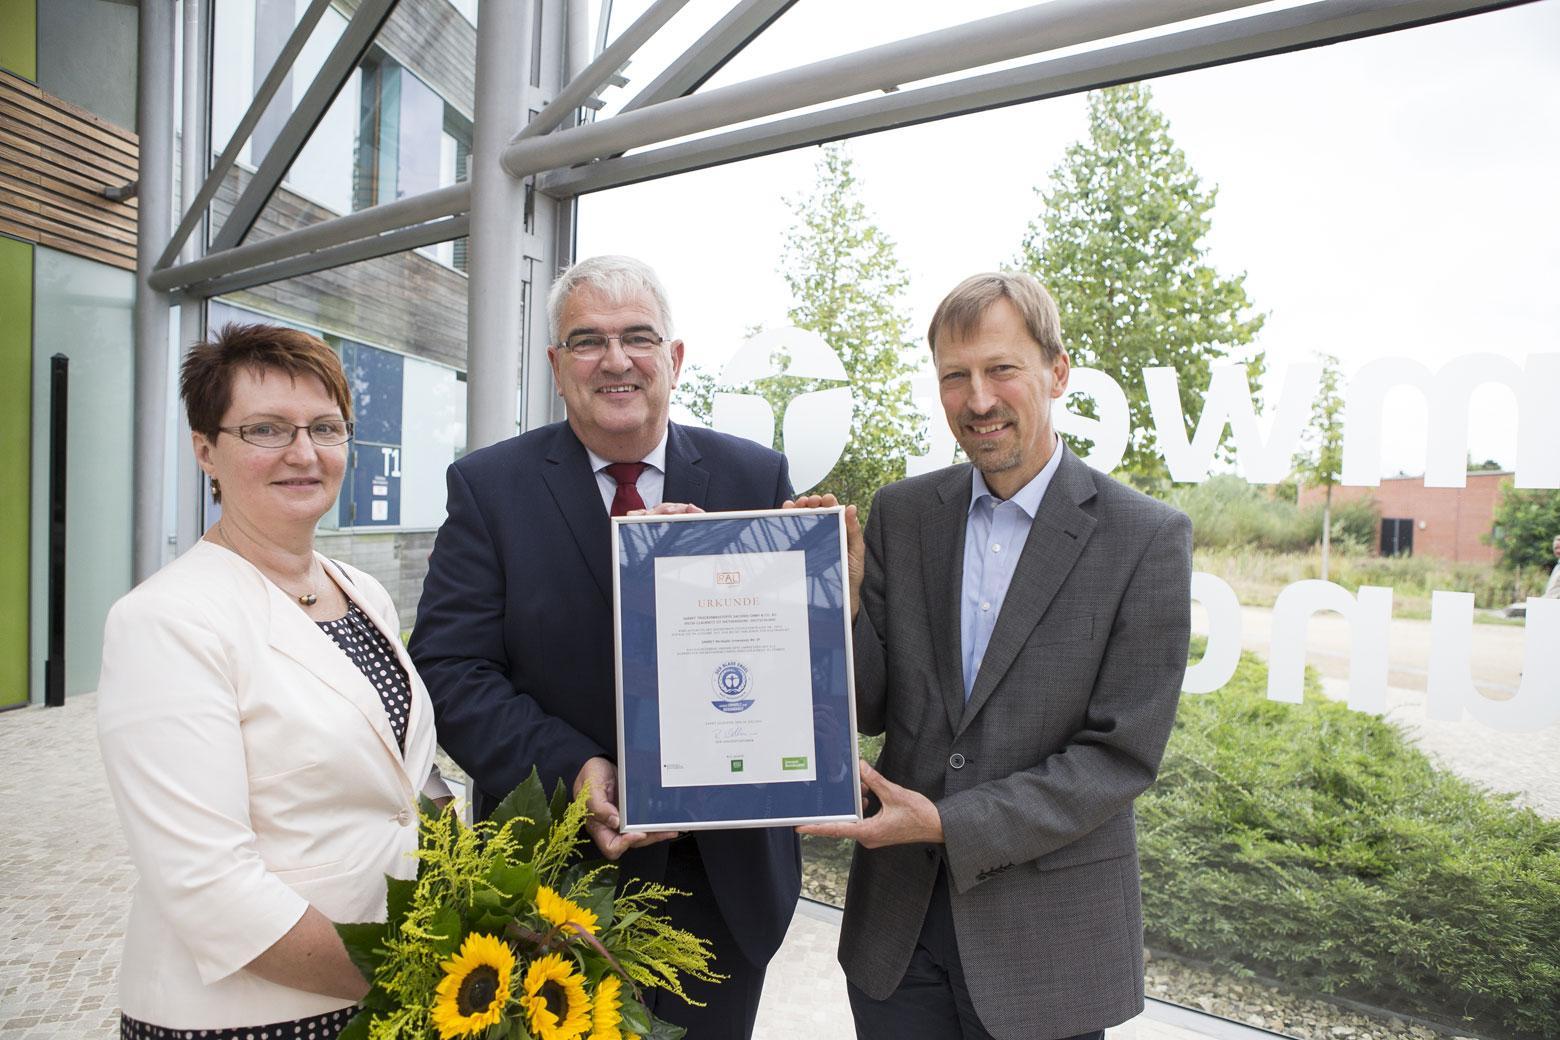 Preisverleihung im Umweltbundesamt in Dessau. SAKRET erhält den Blauen Engel. Petra Meier, Thomas Utermöller, Dr. Wolfgang Plehn (v.l.n.r.).